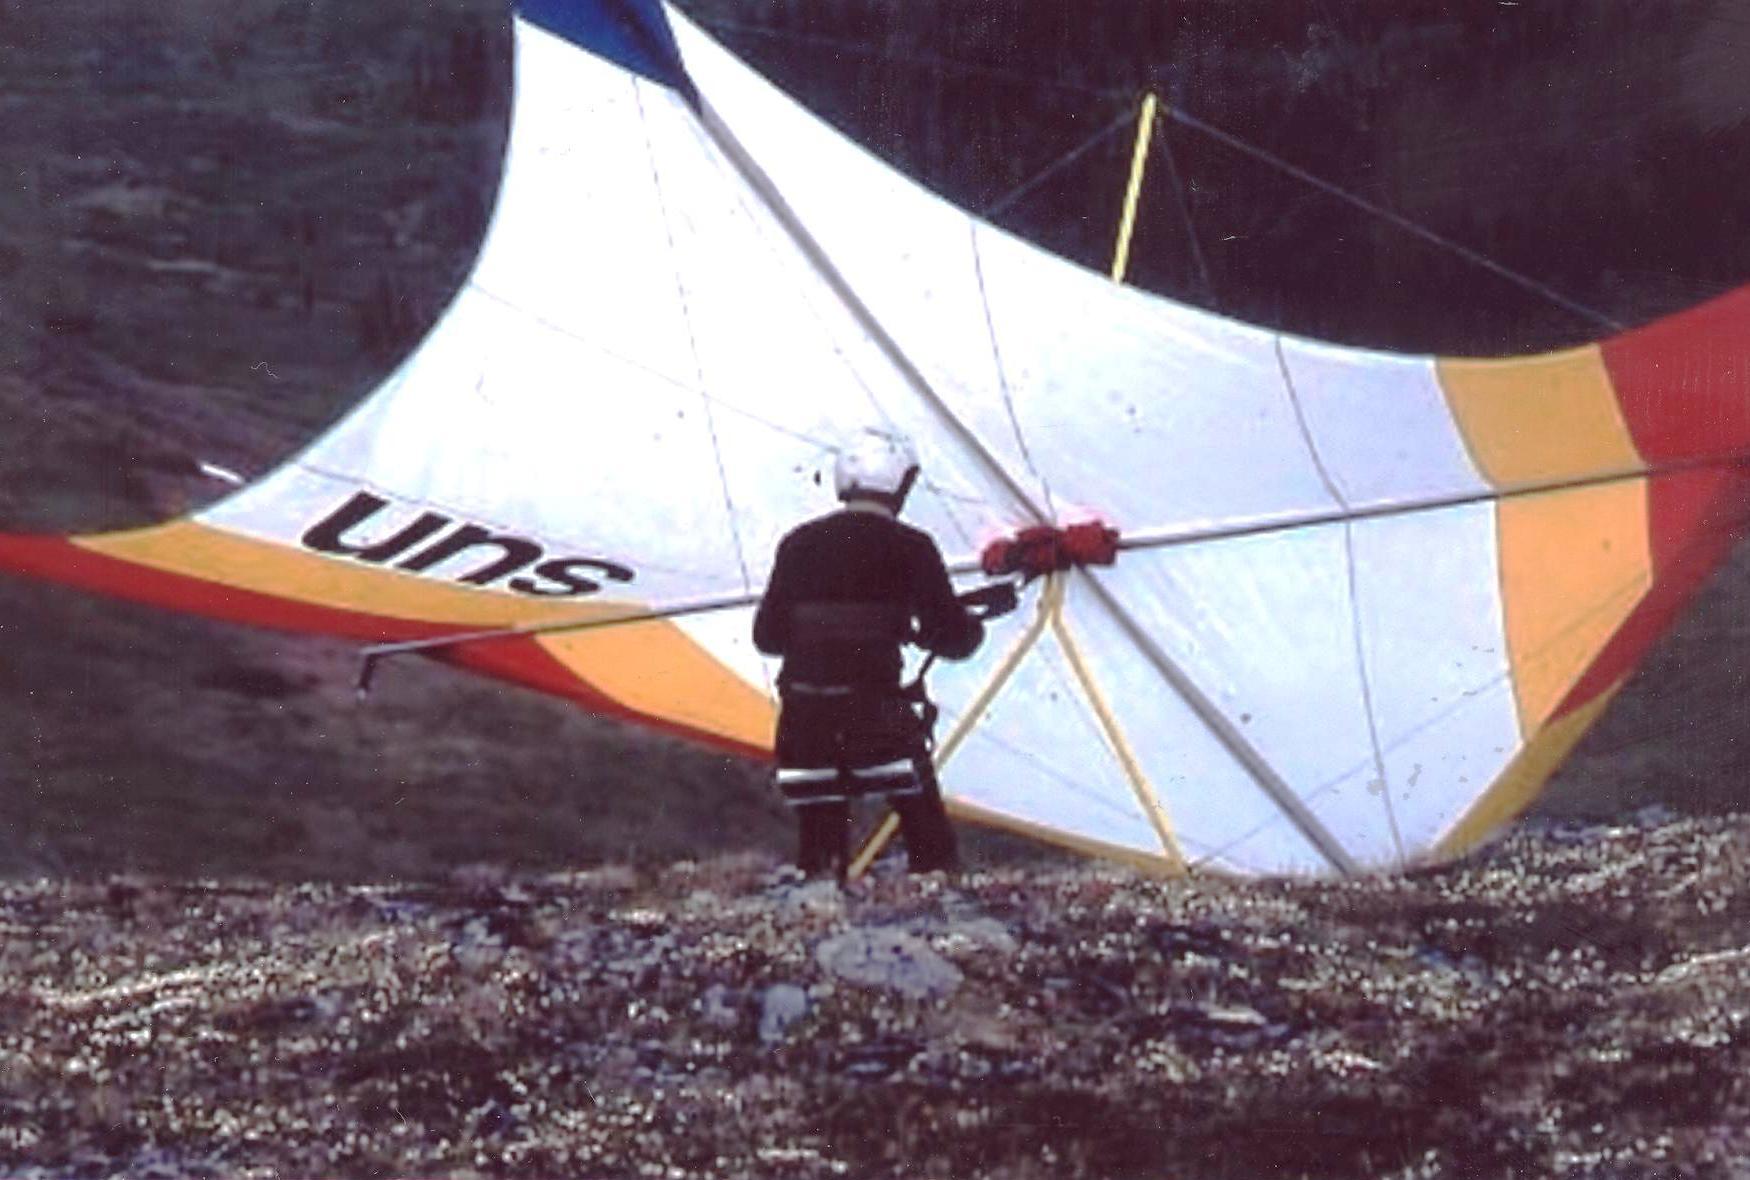 bill-sheka-june-1977-ridge-behind-eagle-summit-alaska-preparing-for-over-one-hour-soaring-flight-sun3-swallowtail